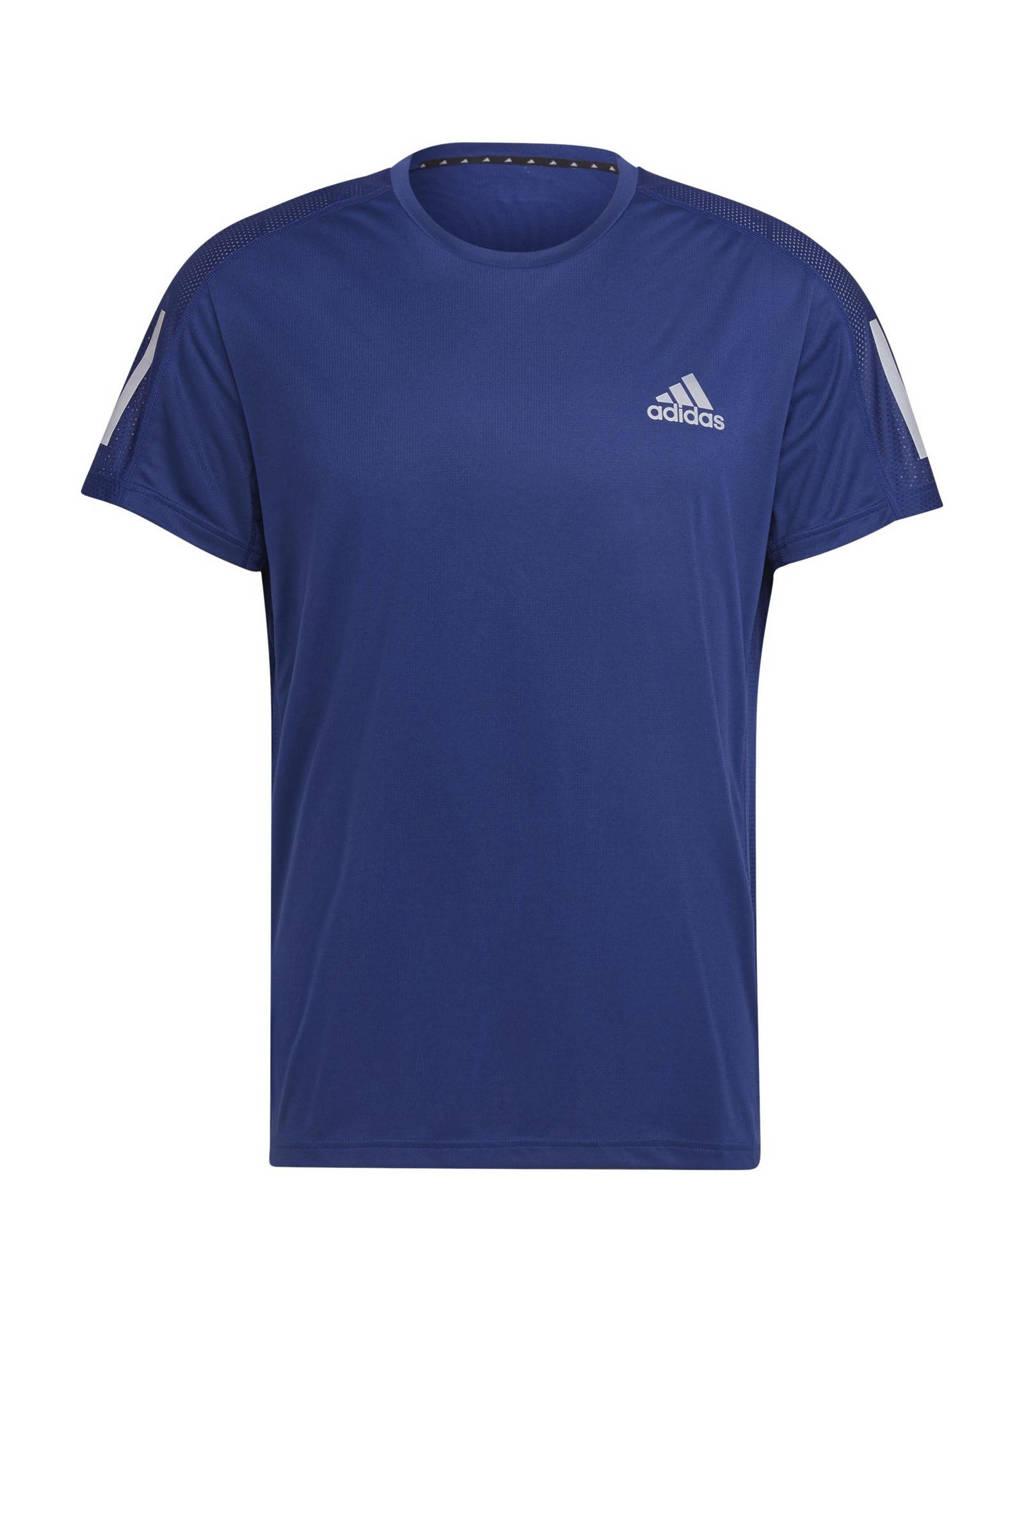 adidas Performance   Own The Run hardloop T-shirt donkerblauw, Donkerblauw